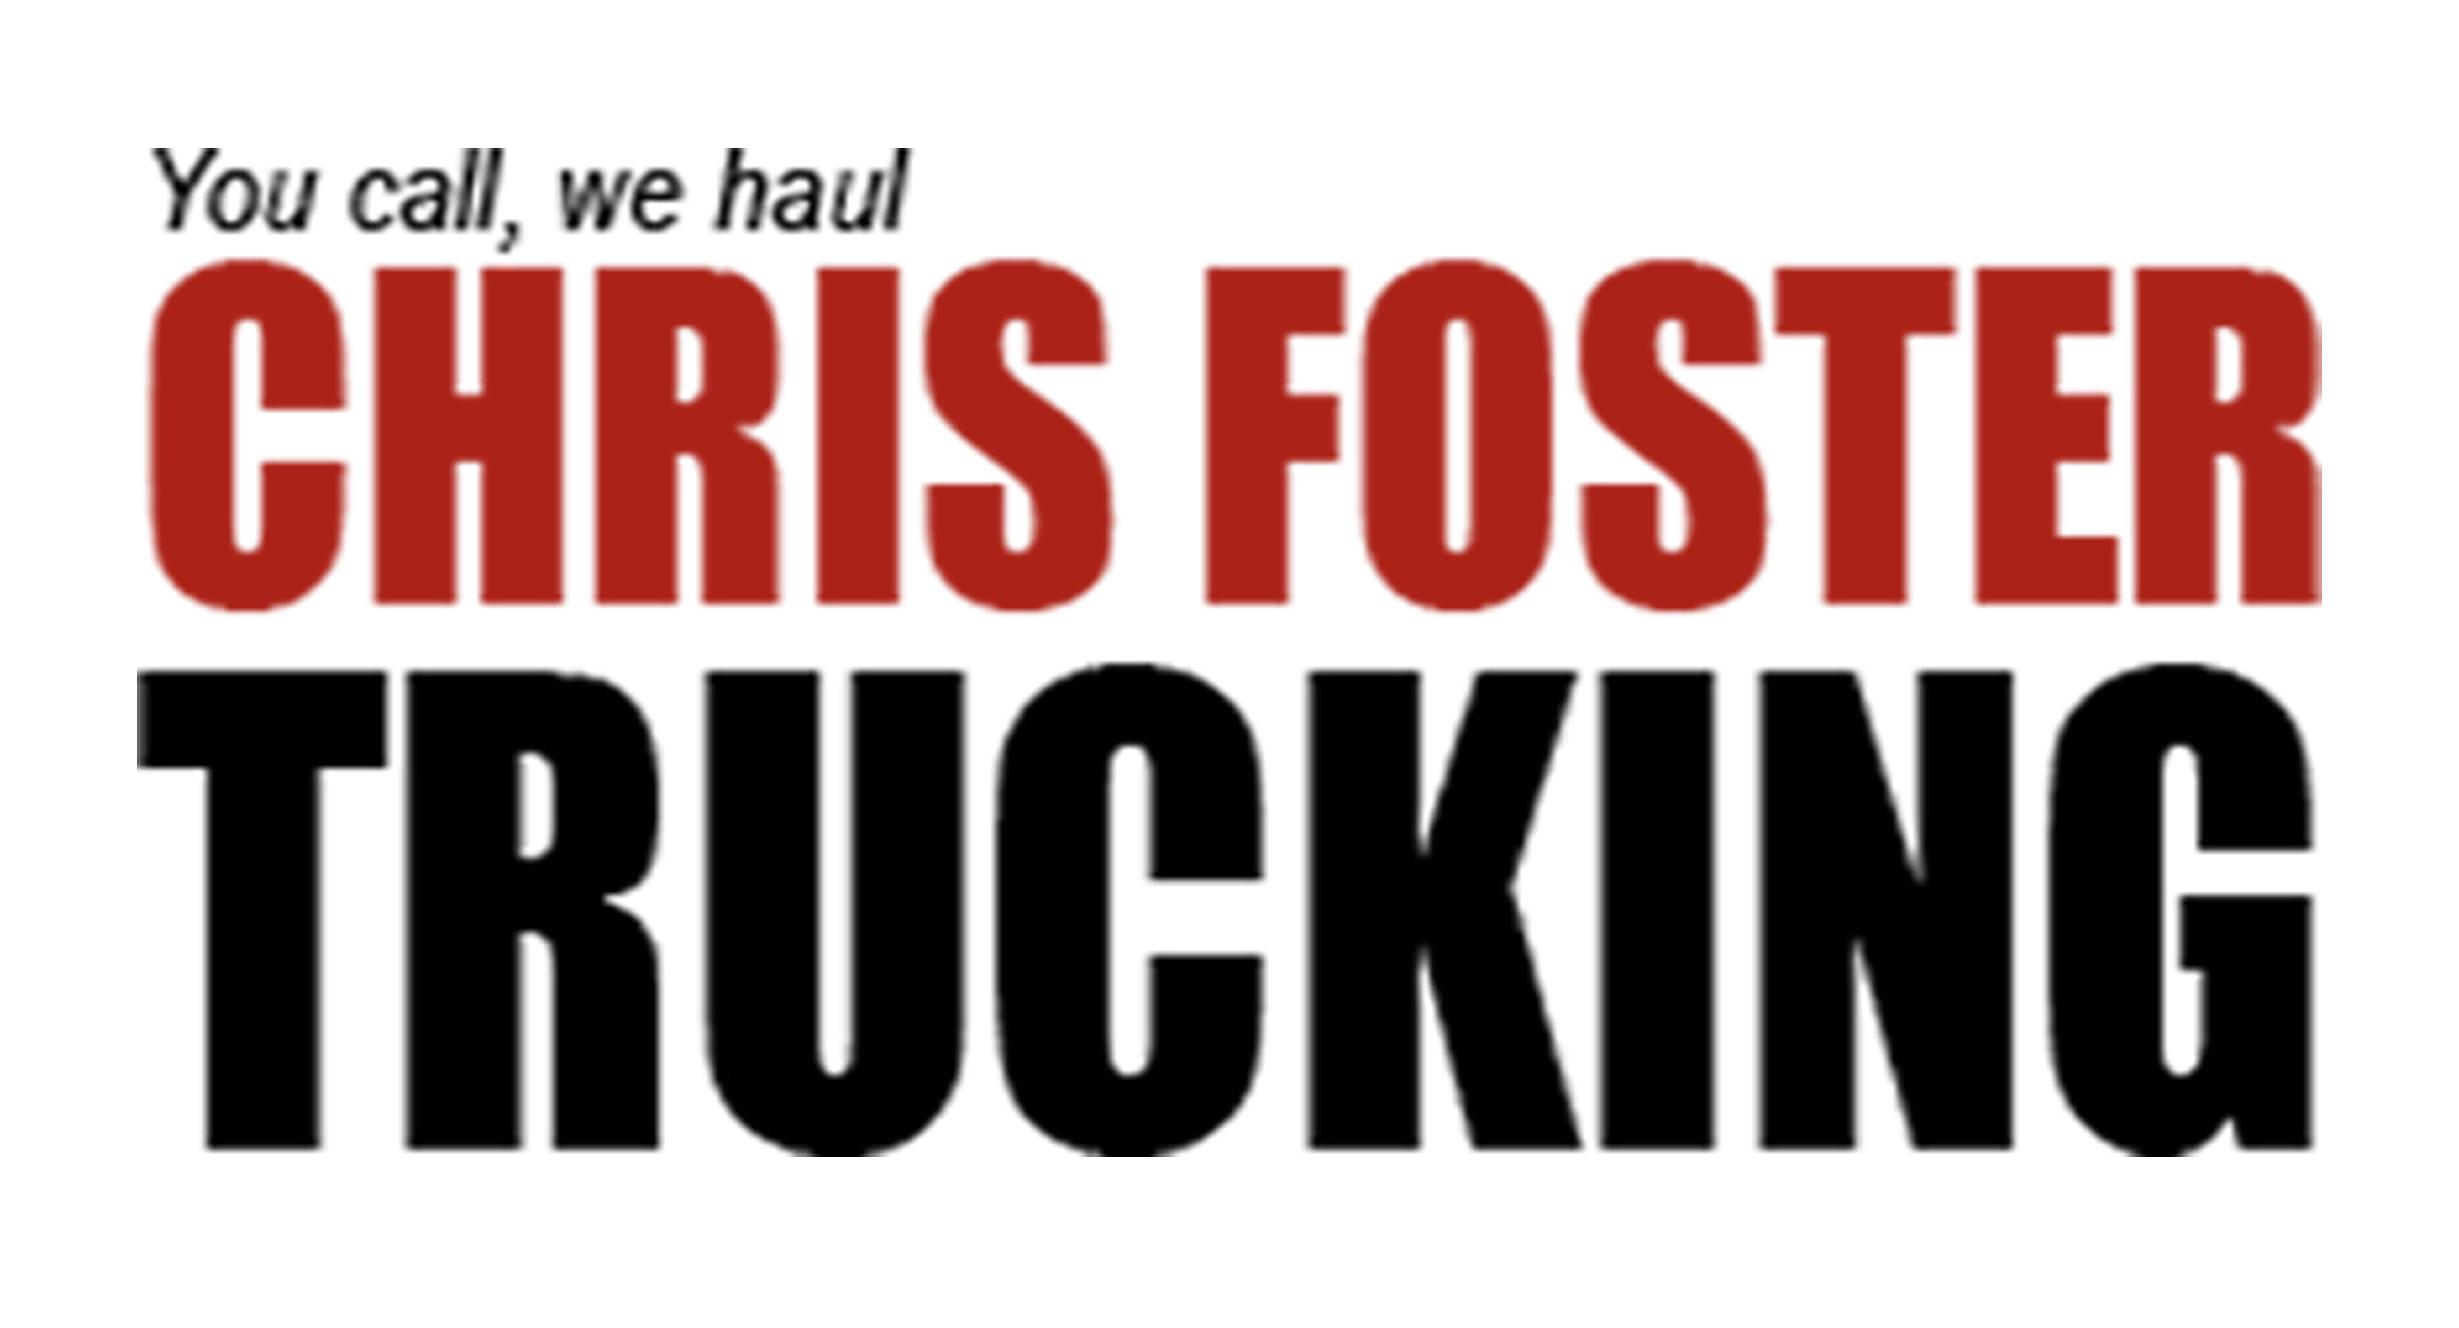 Chris Foster Trucking 1.jpg